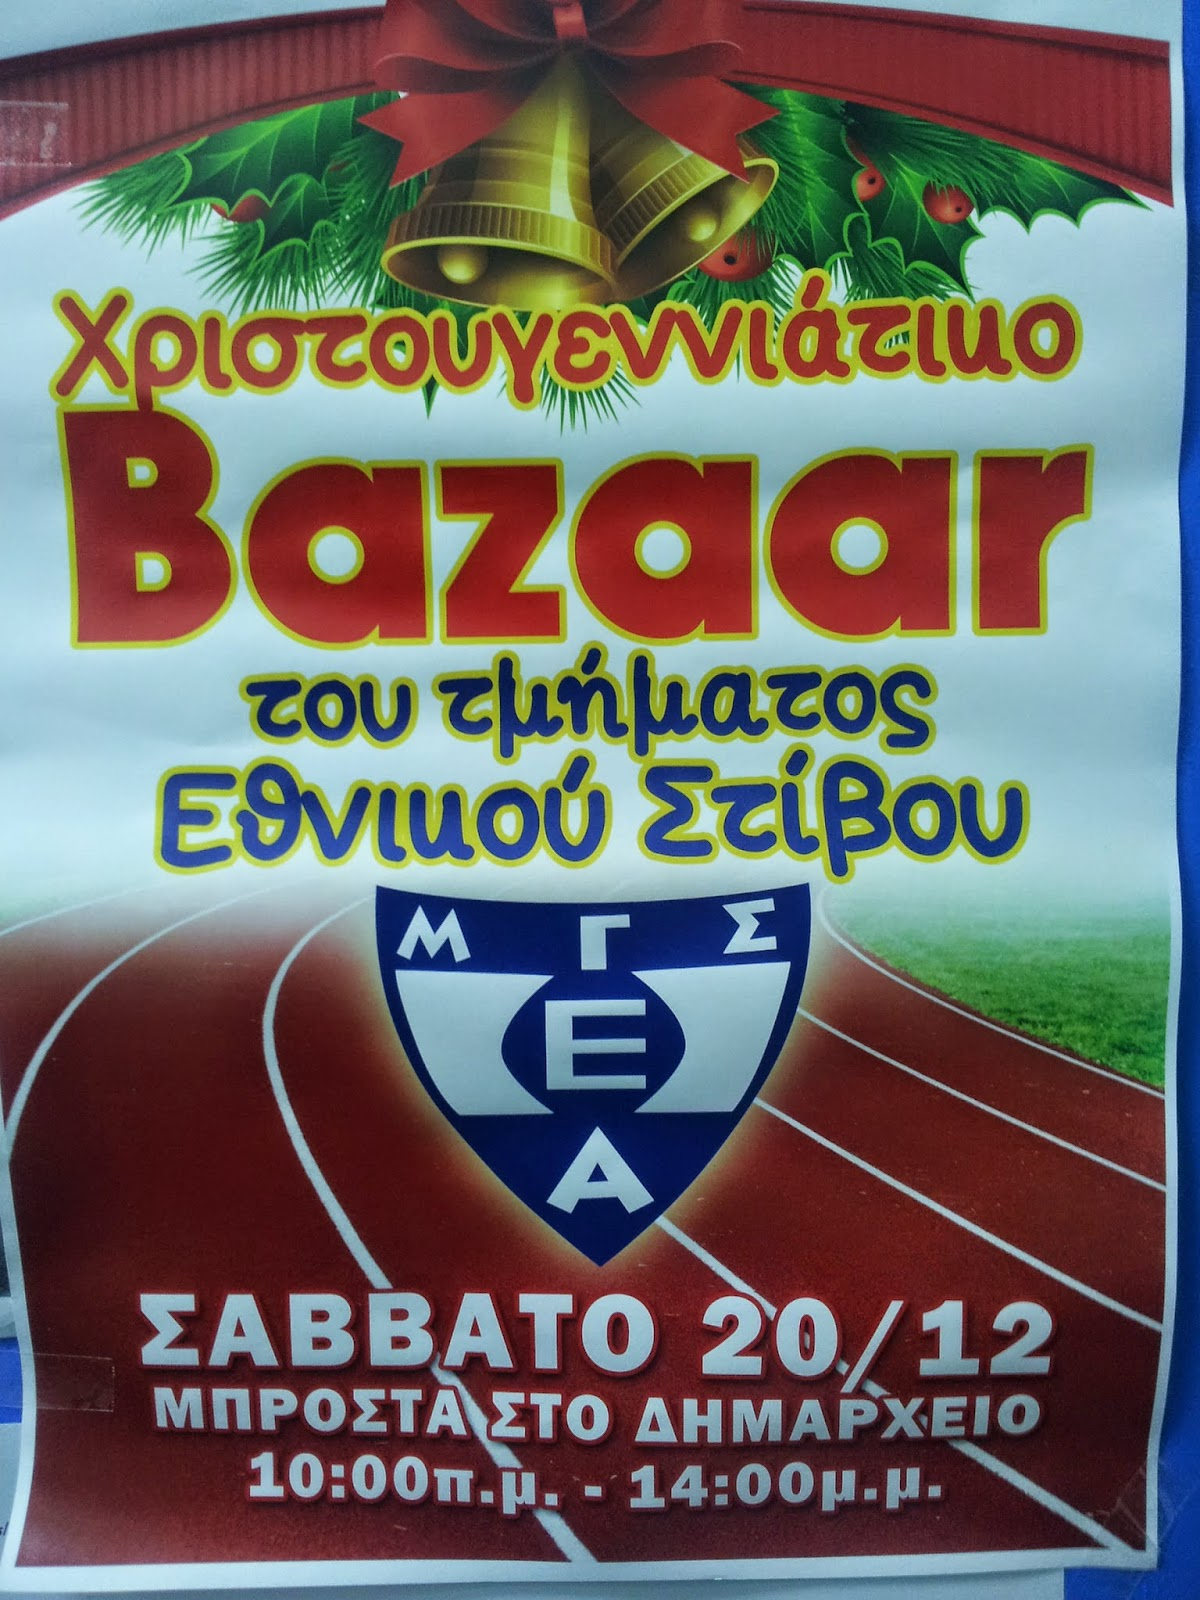 To Σάββατο 20 12 μπροστά στο Δημαρχείο το τμήμα στίβου του ΜΓΣ Εθνικός  πραγματοποιεί BAZAAR 7e6dbdee1b3